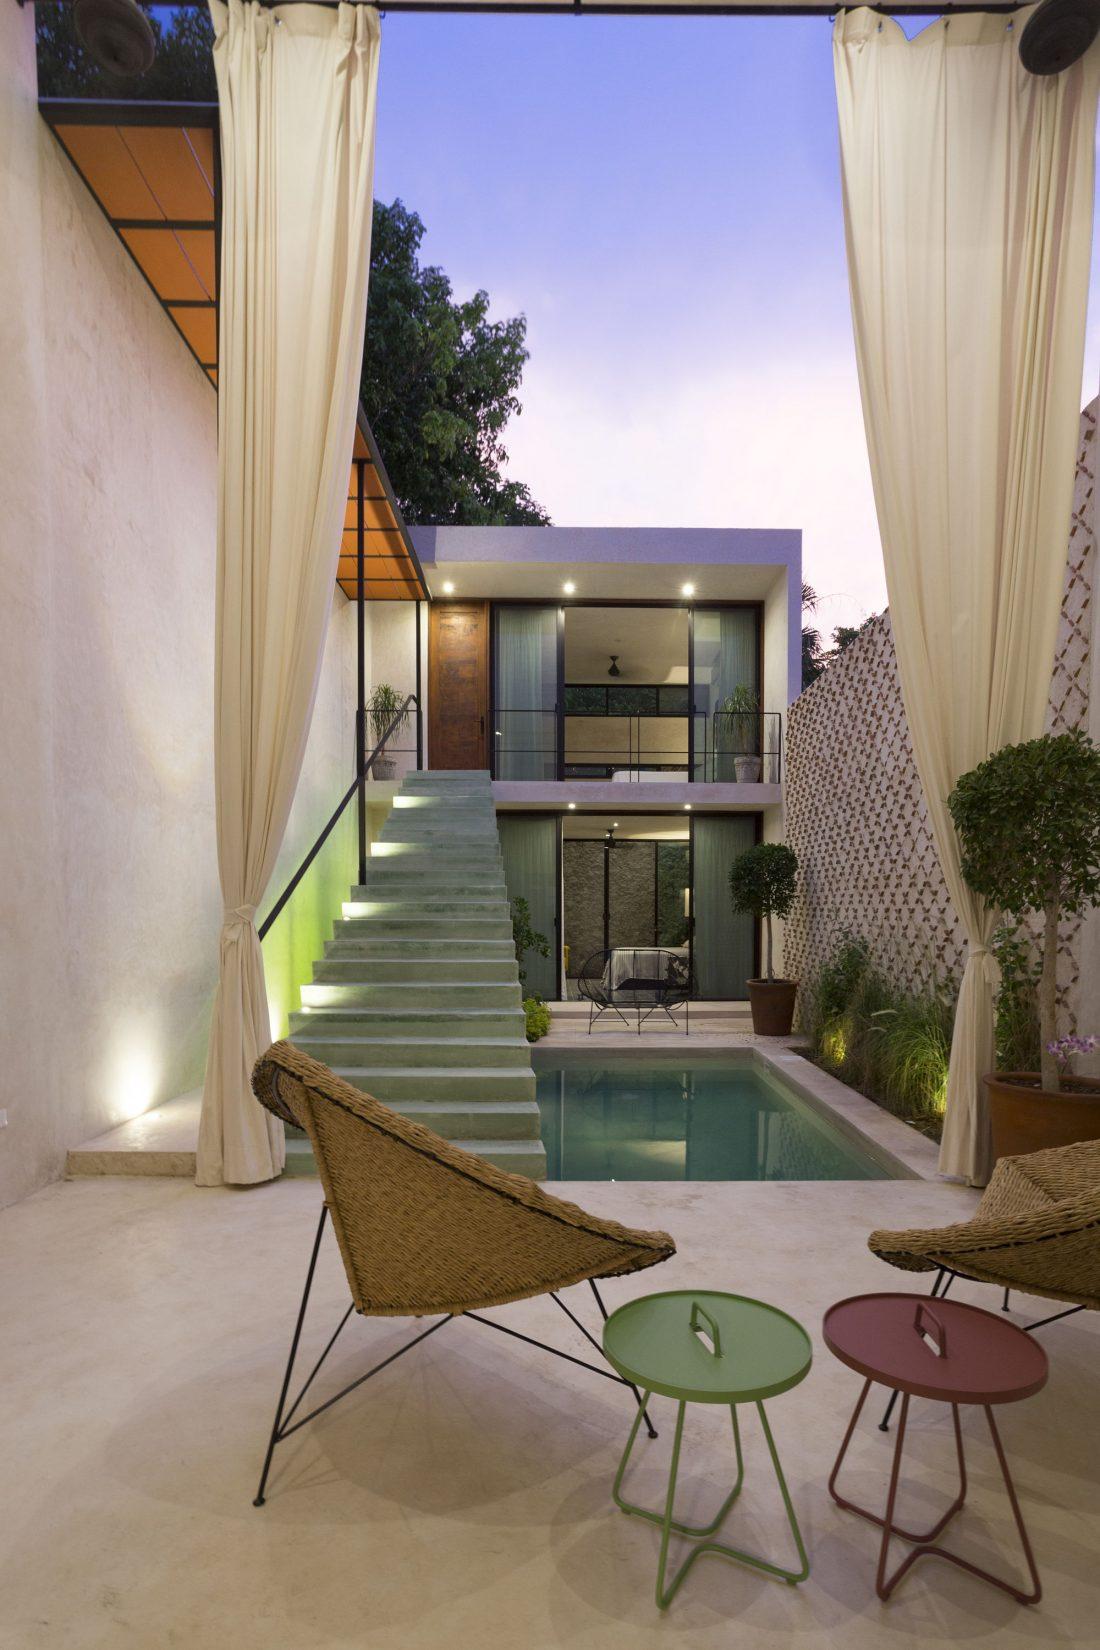 limonnyj-dom-v-meksike-fotografii-interera-16